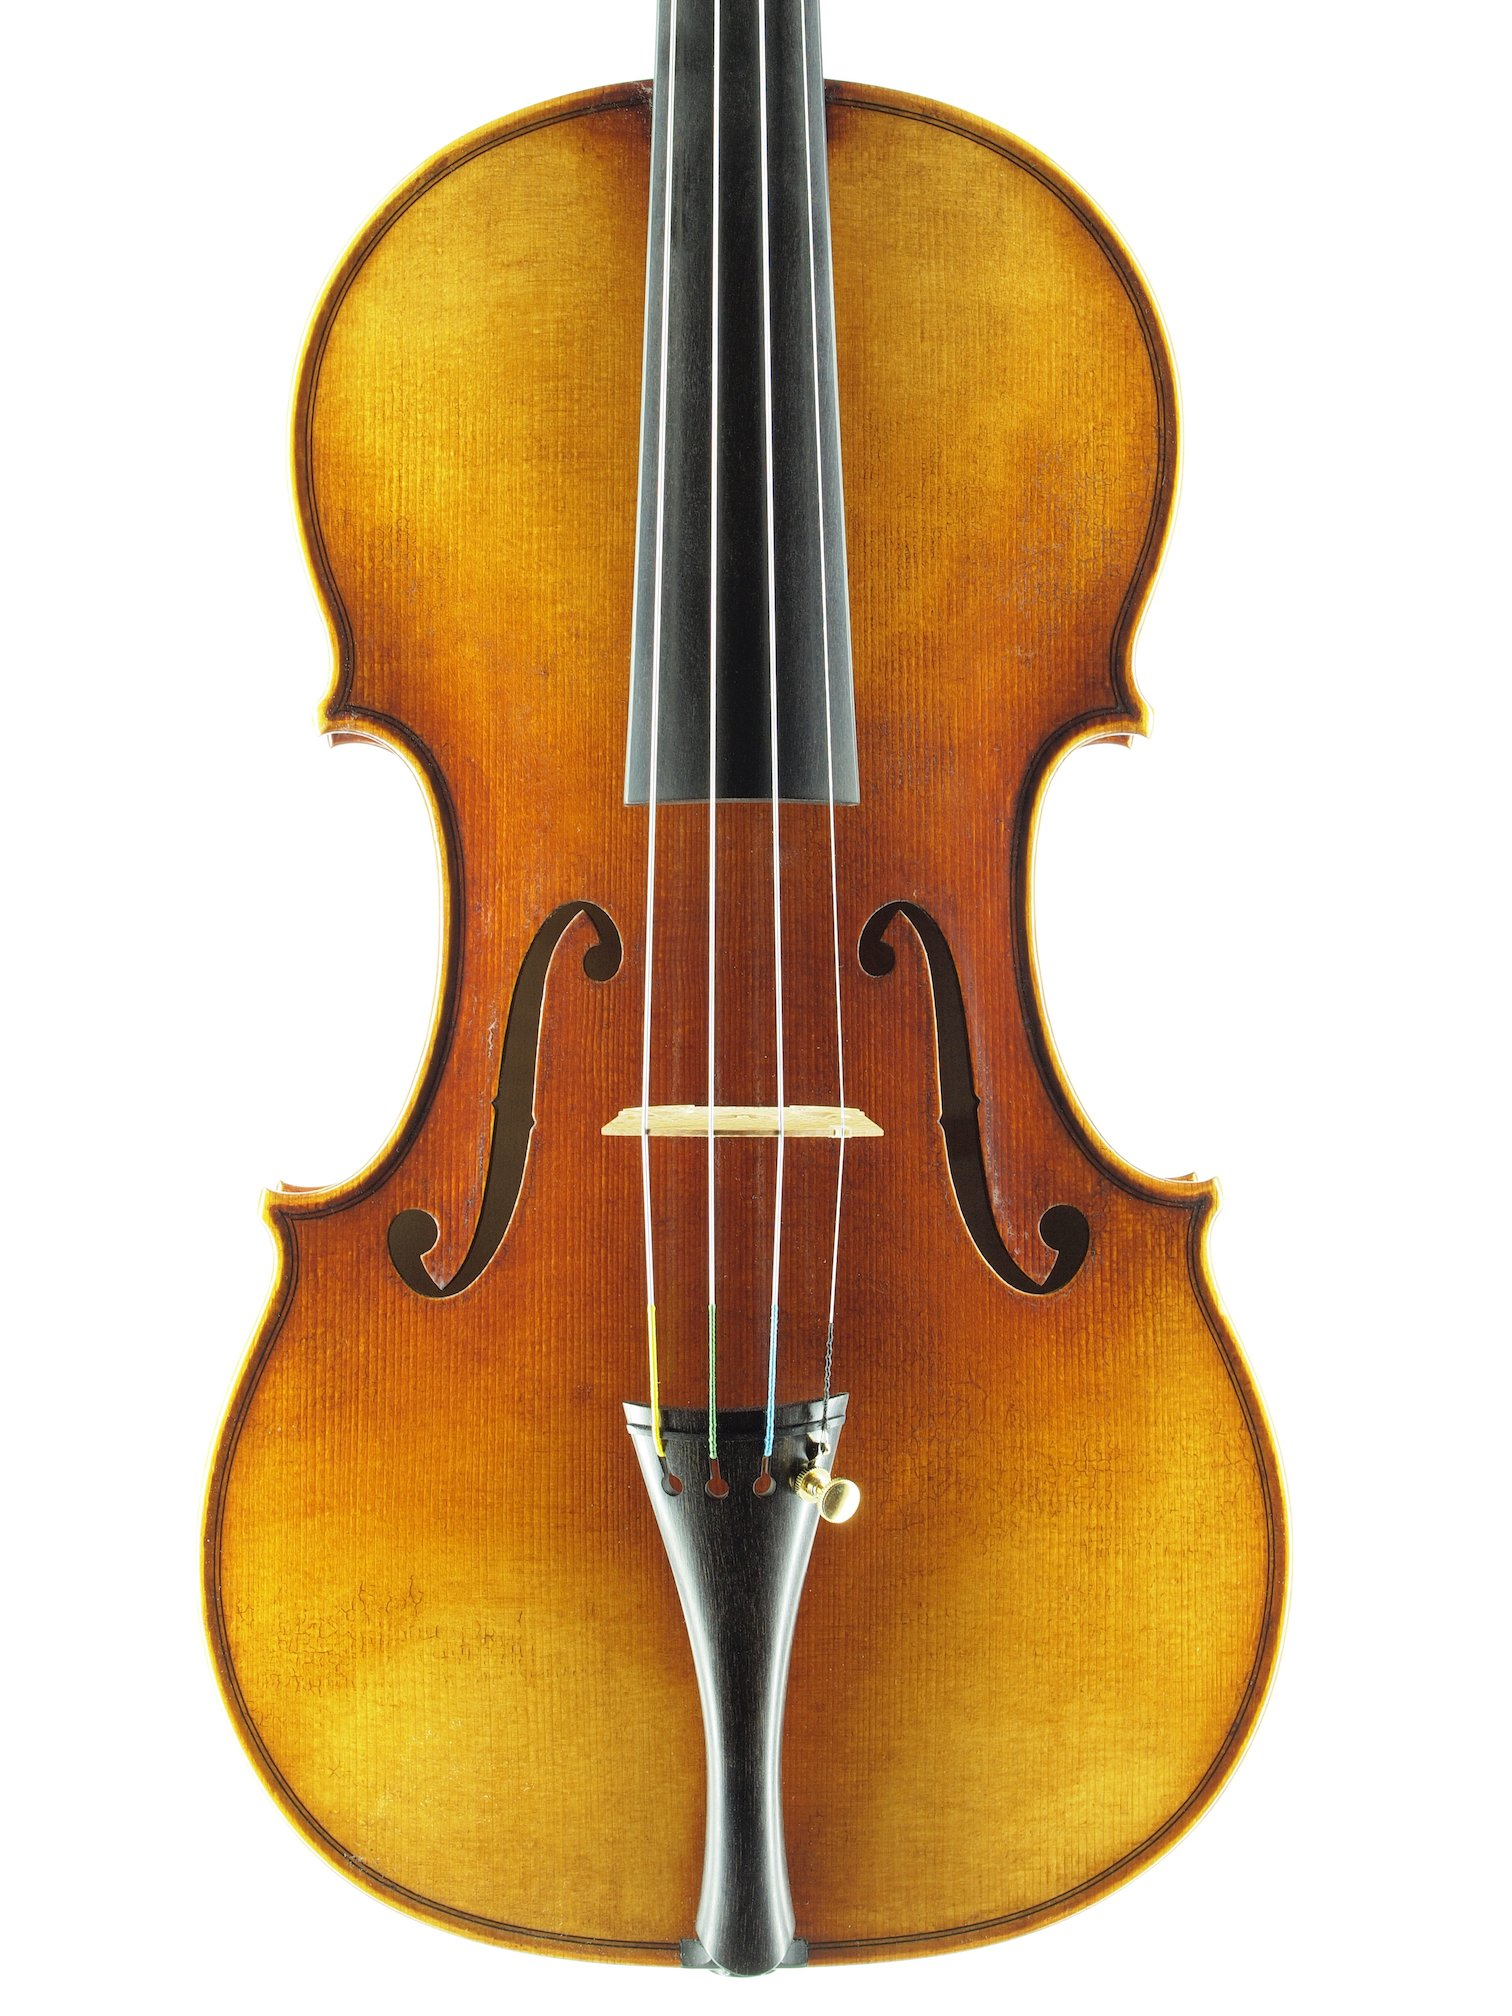 Violin based on the model of the 'Sauret' Guarneri del Gesu anno 1743 II